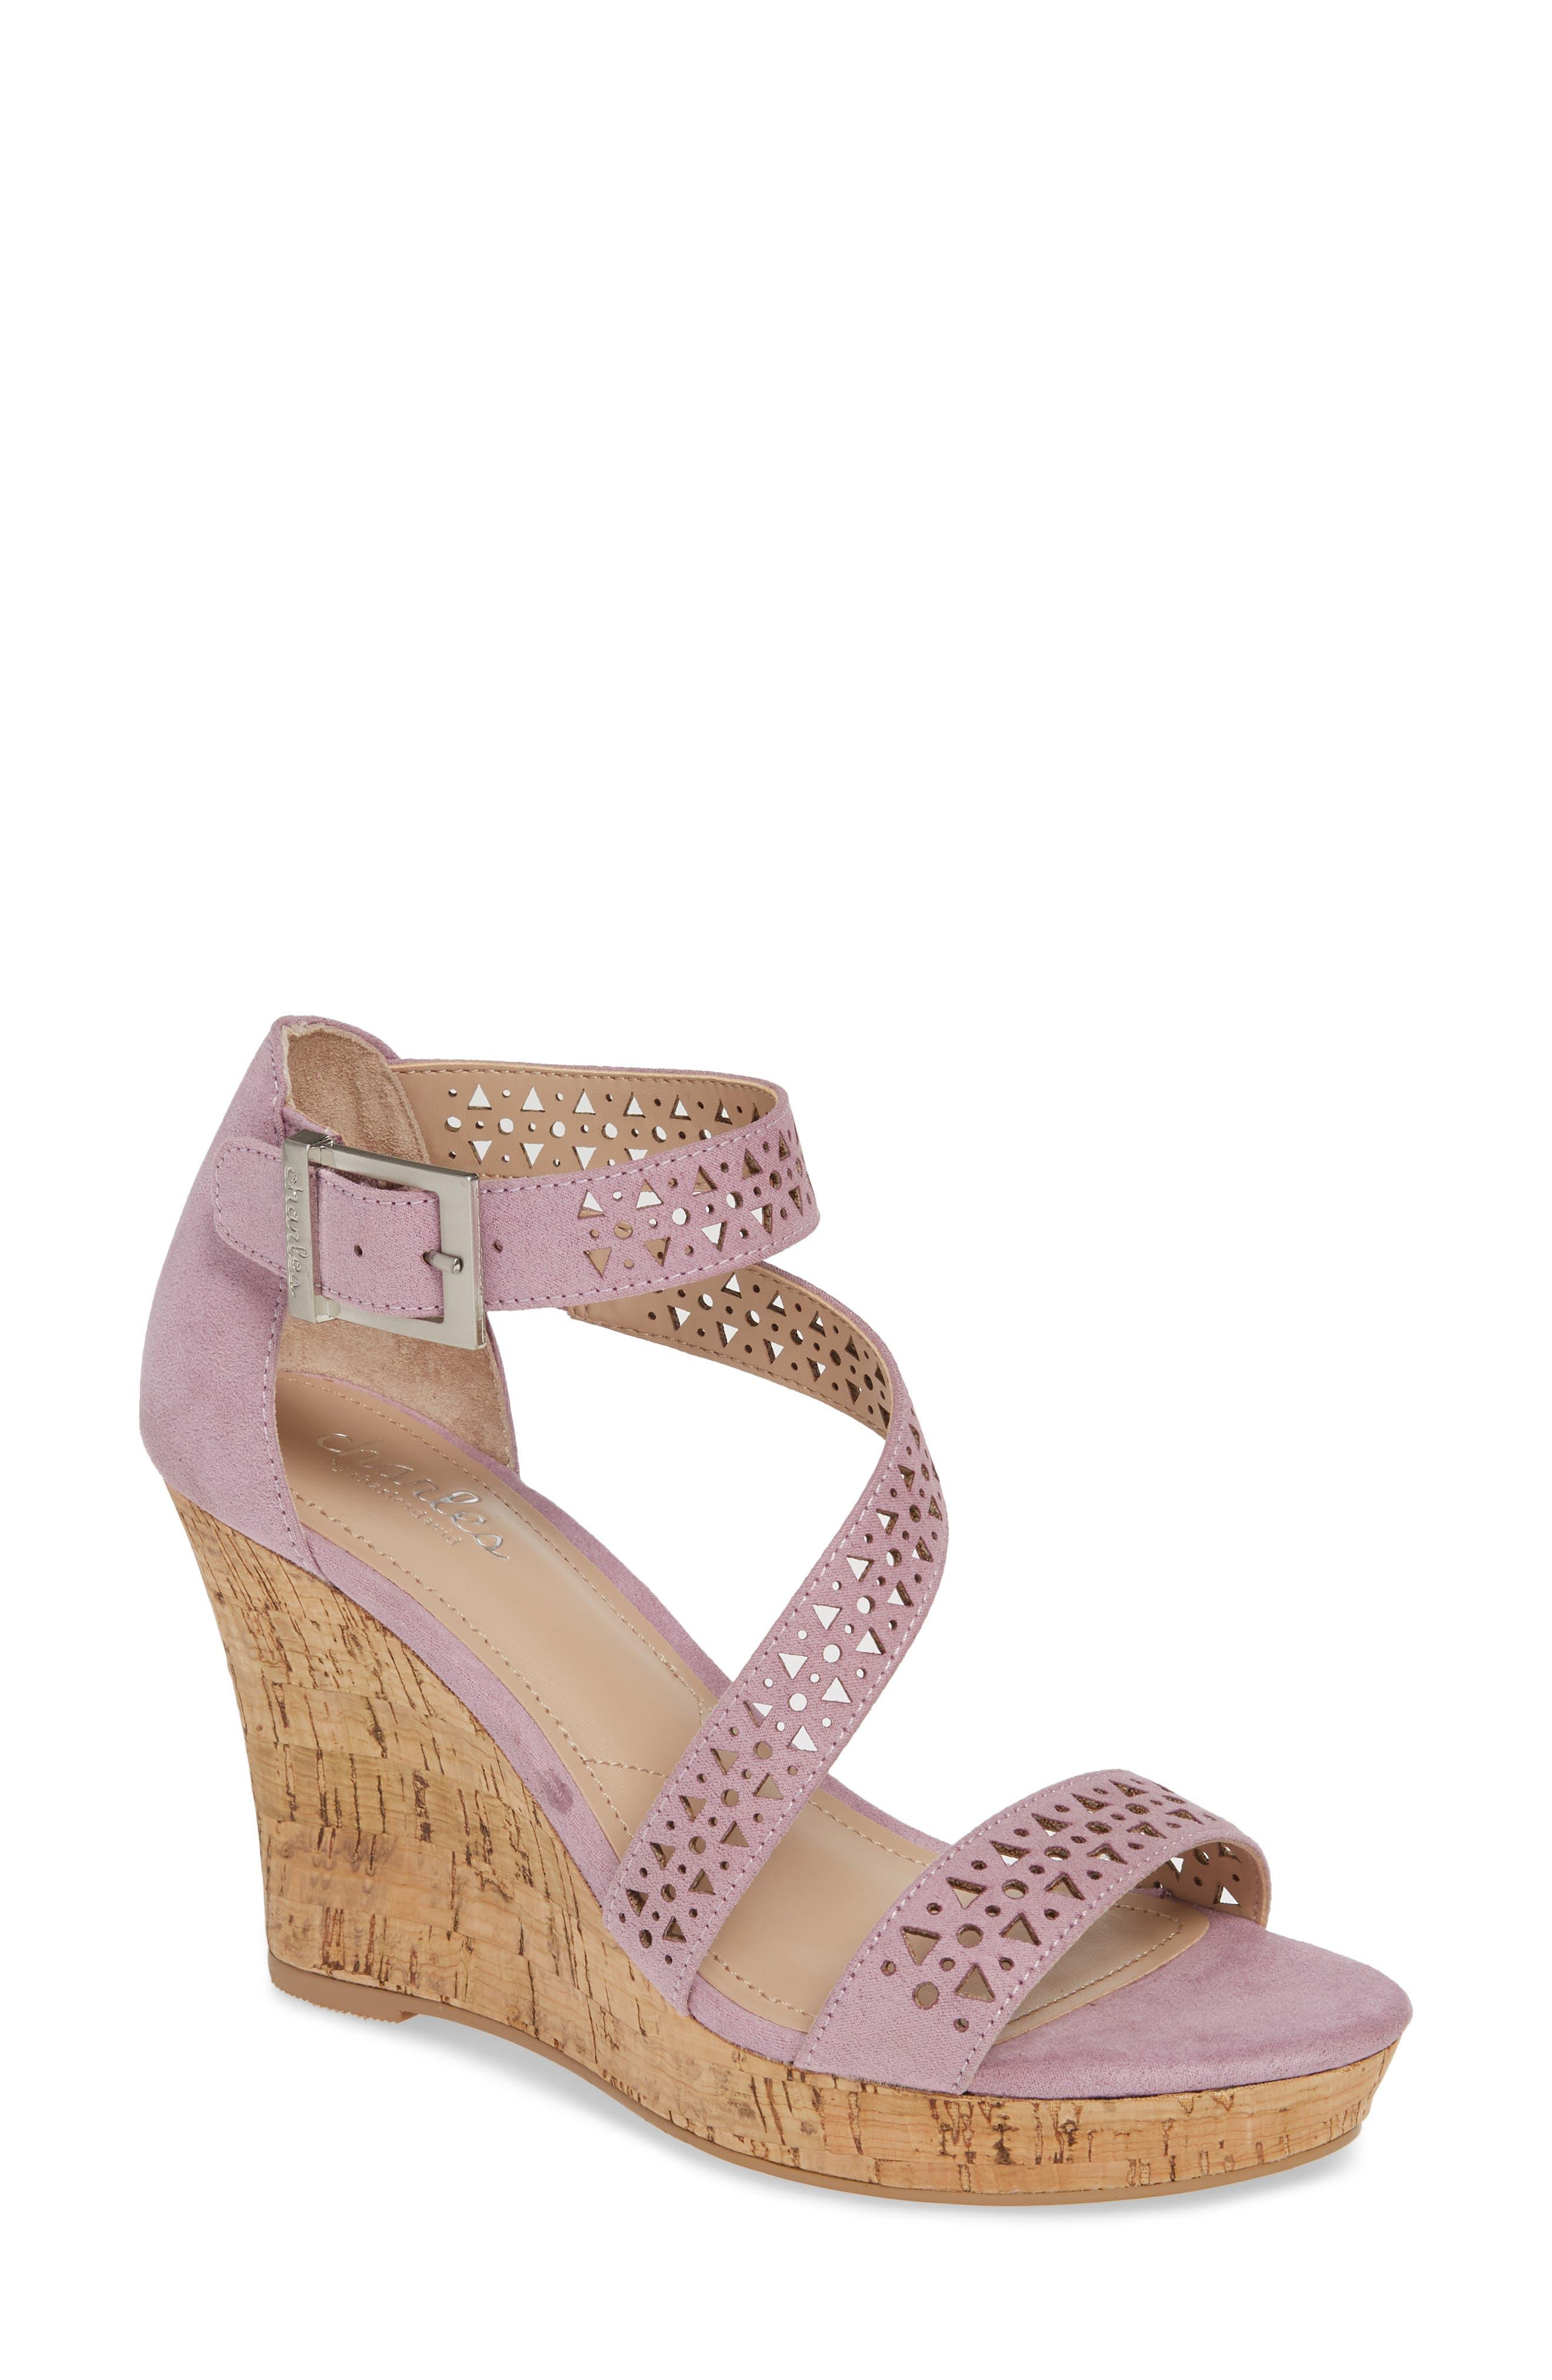 Charles By Charles David Landon Perforated Wedge Sandal- Purple